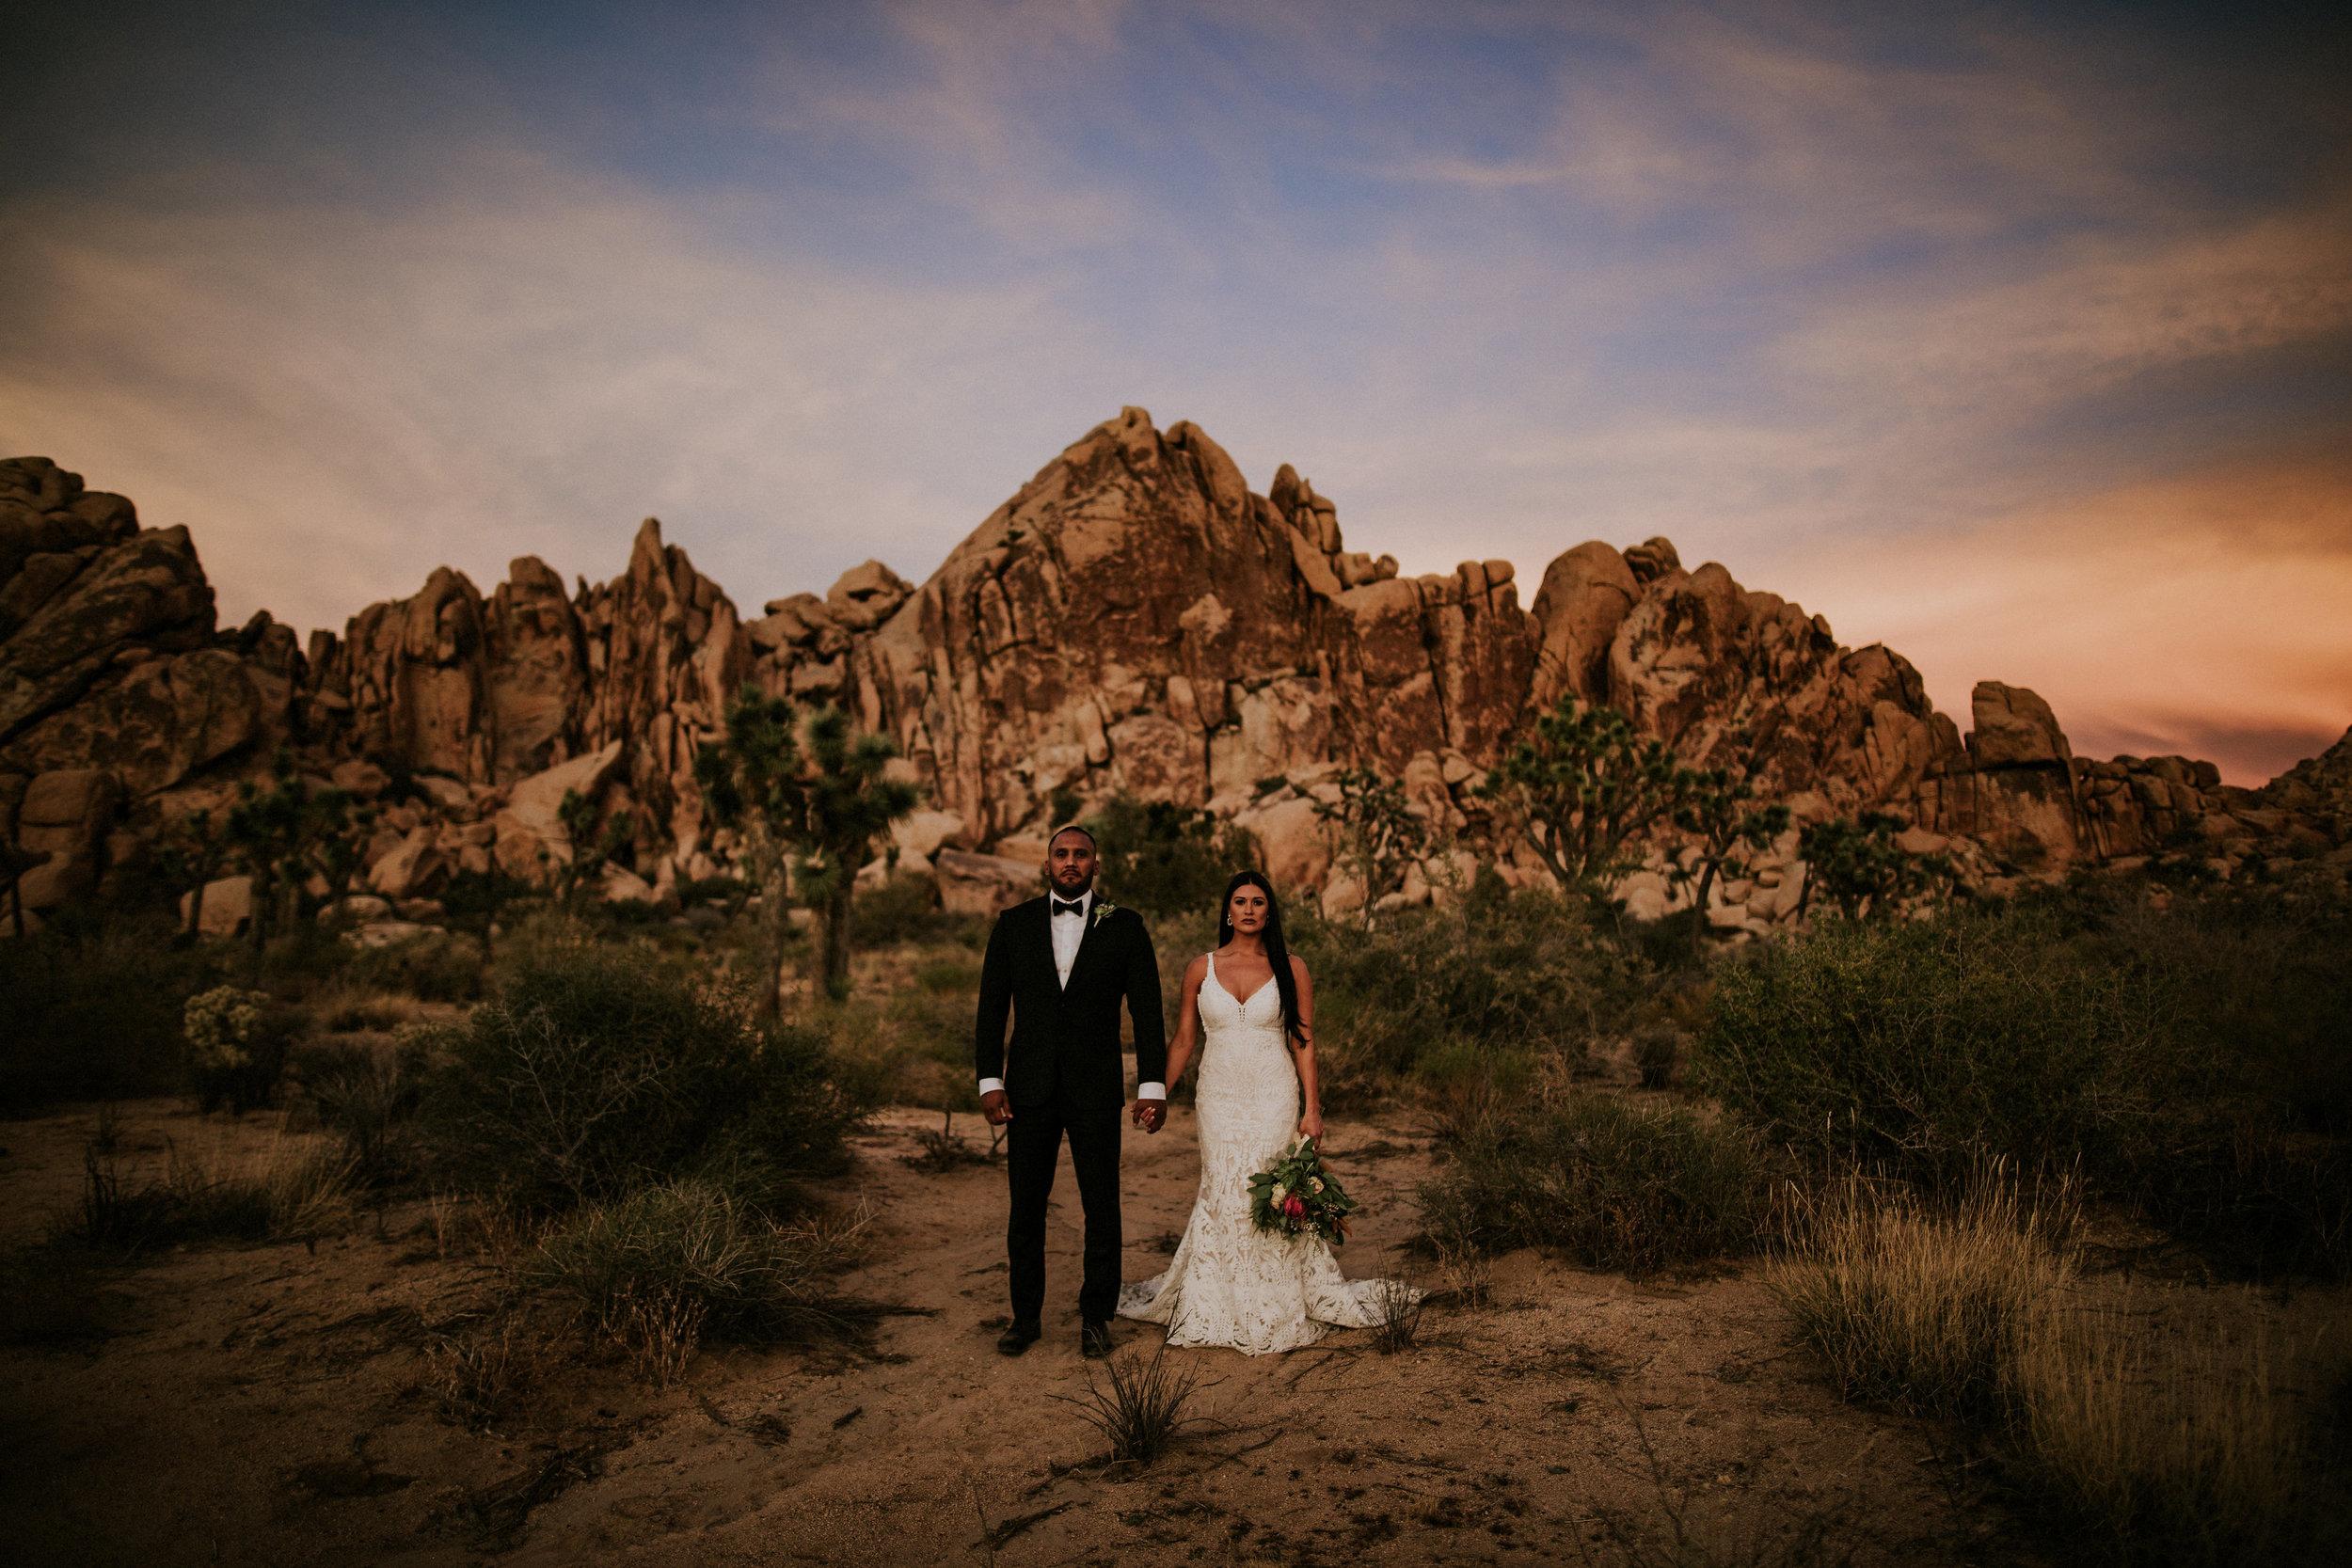 Amanda + Hass | Joshua Tree National Park, California | Elopement Photo + Video